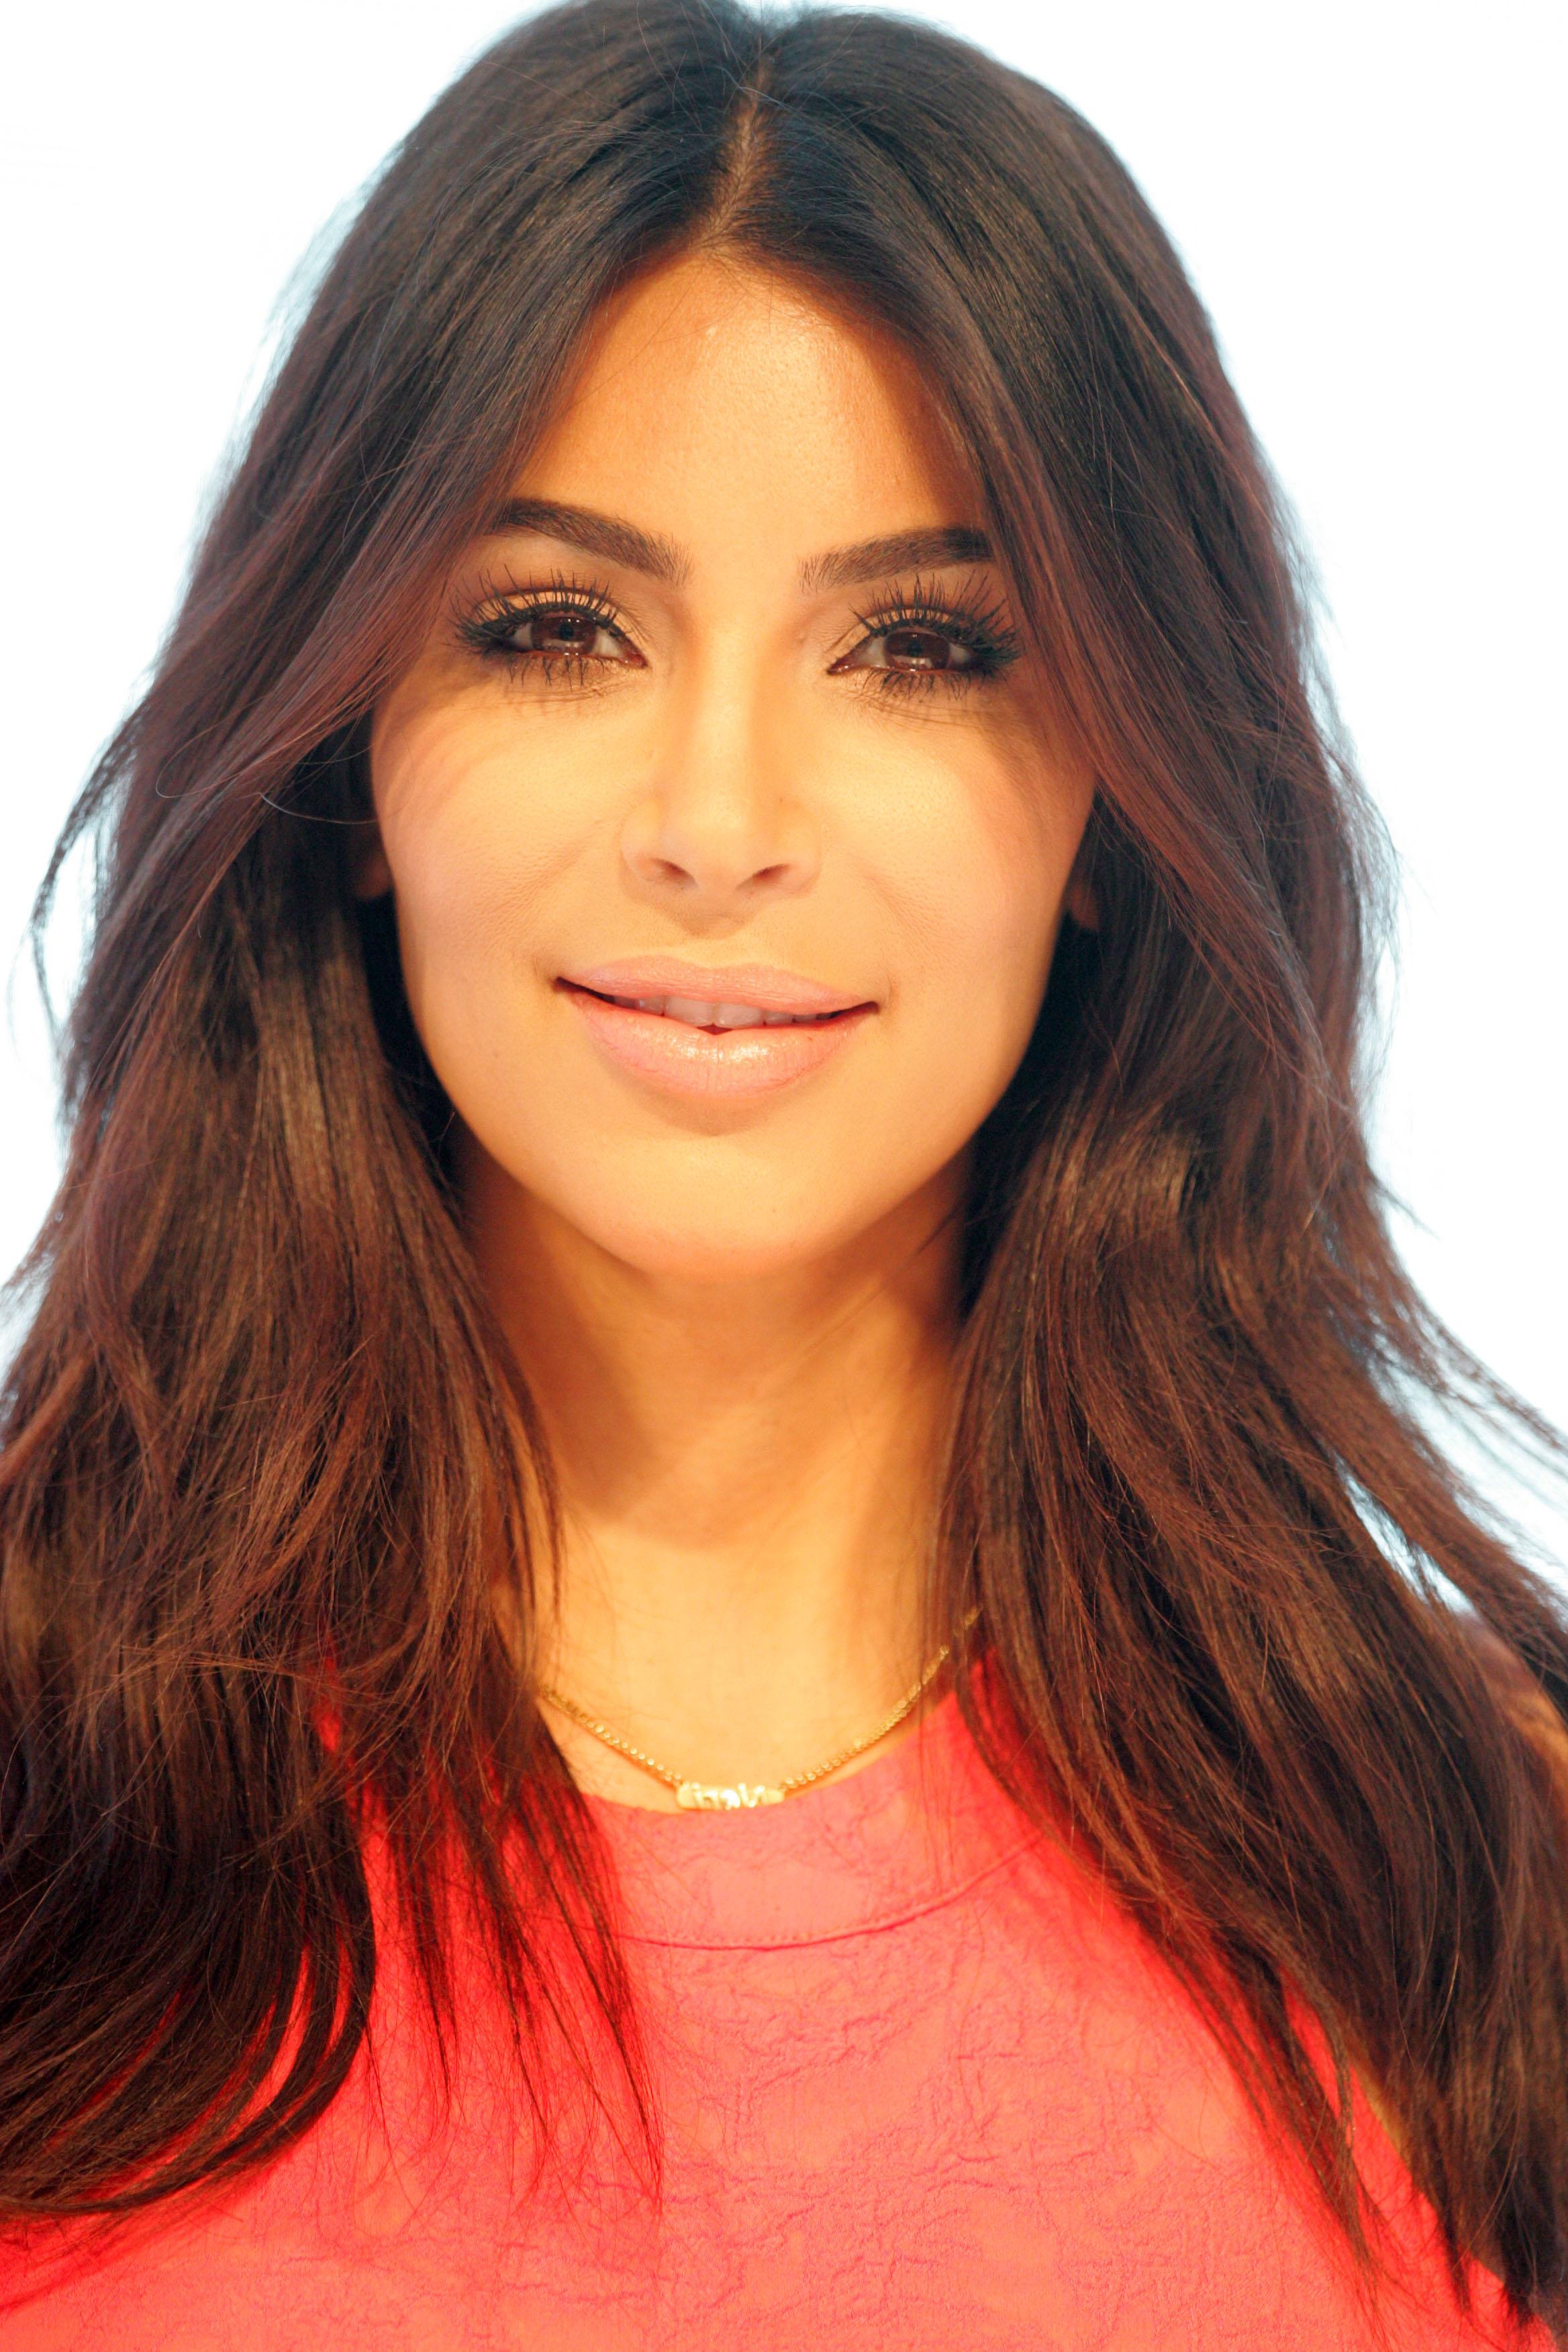 Kim Kardashian Wallpaper Iphone 2336x3504